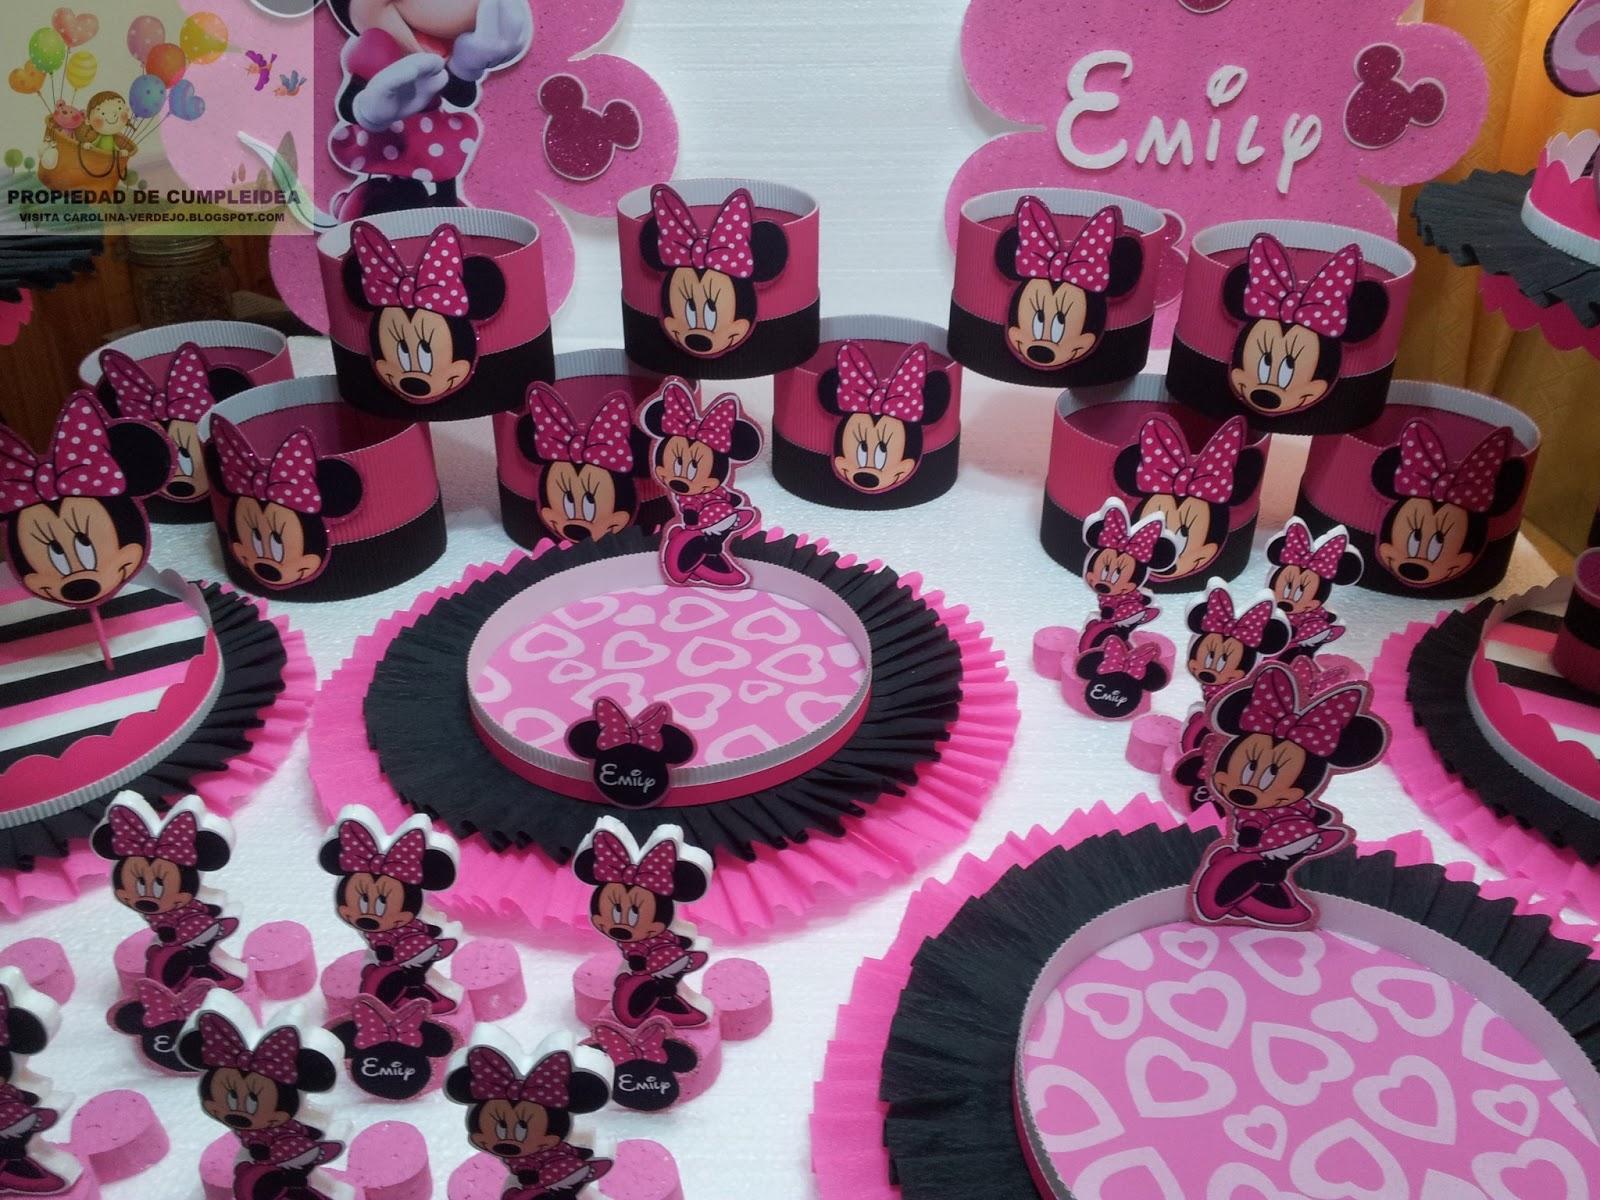 Decoraciones infantiles minnie mouse - Decoraciones para cumpleanos infantiles ...